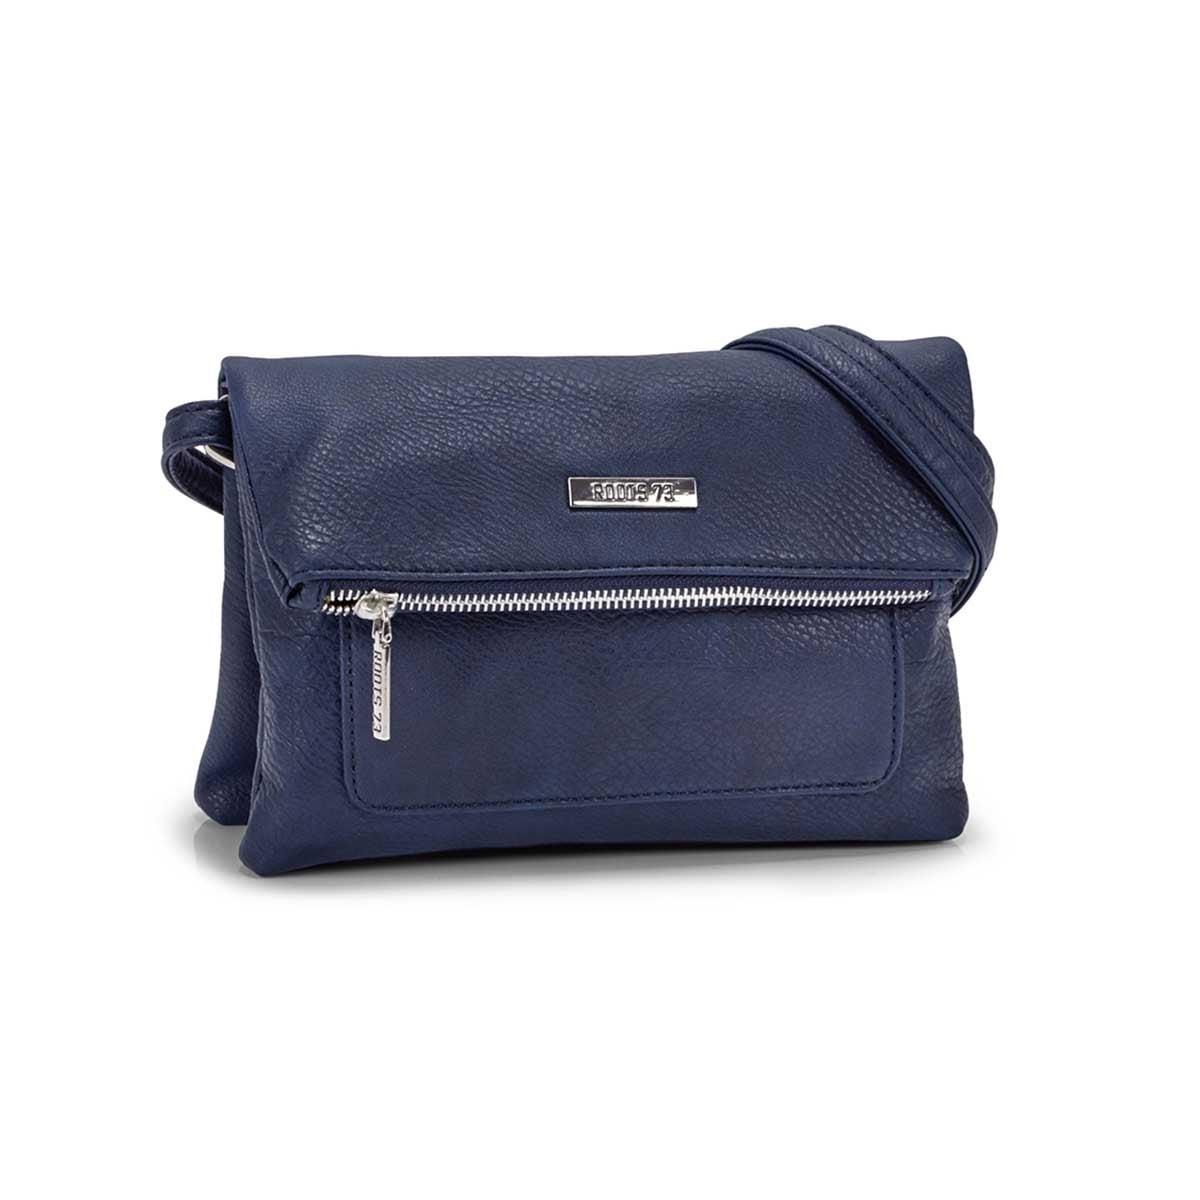 Women`s R5050 blue EAST/WEST crossbody bag